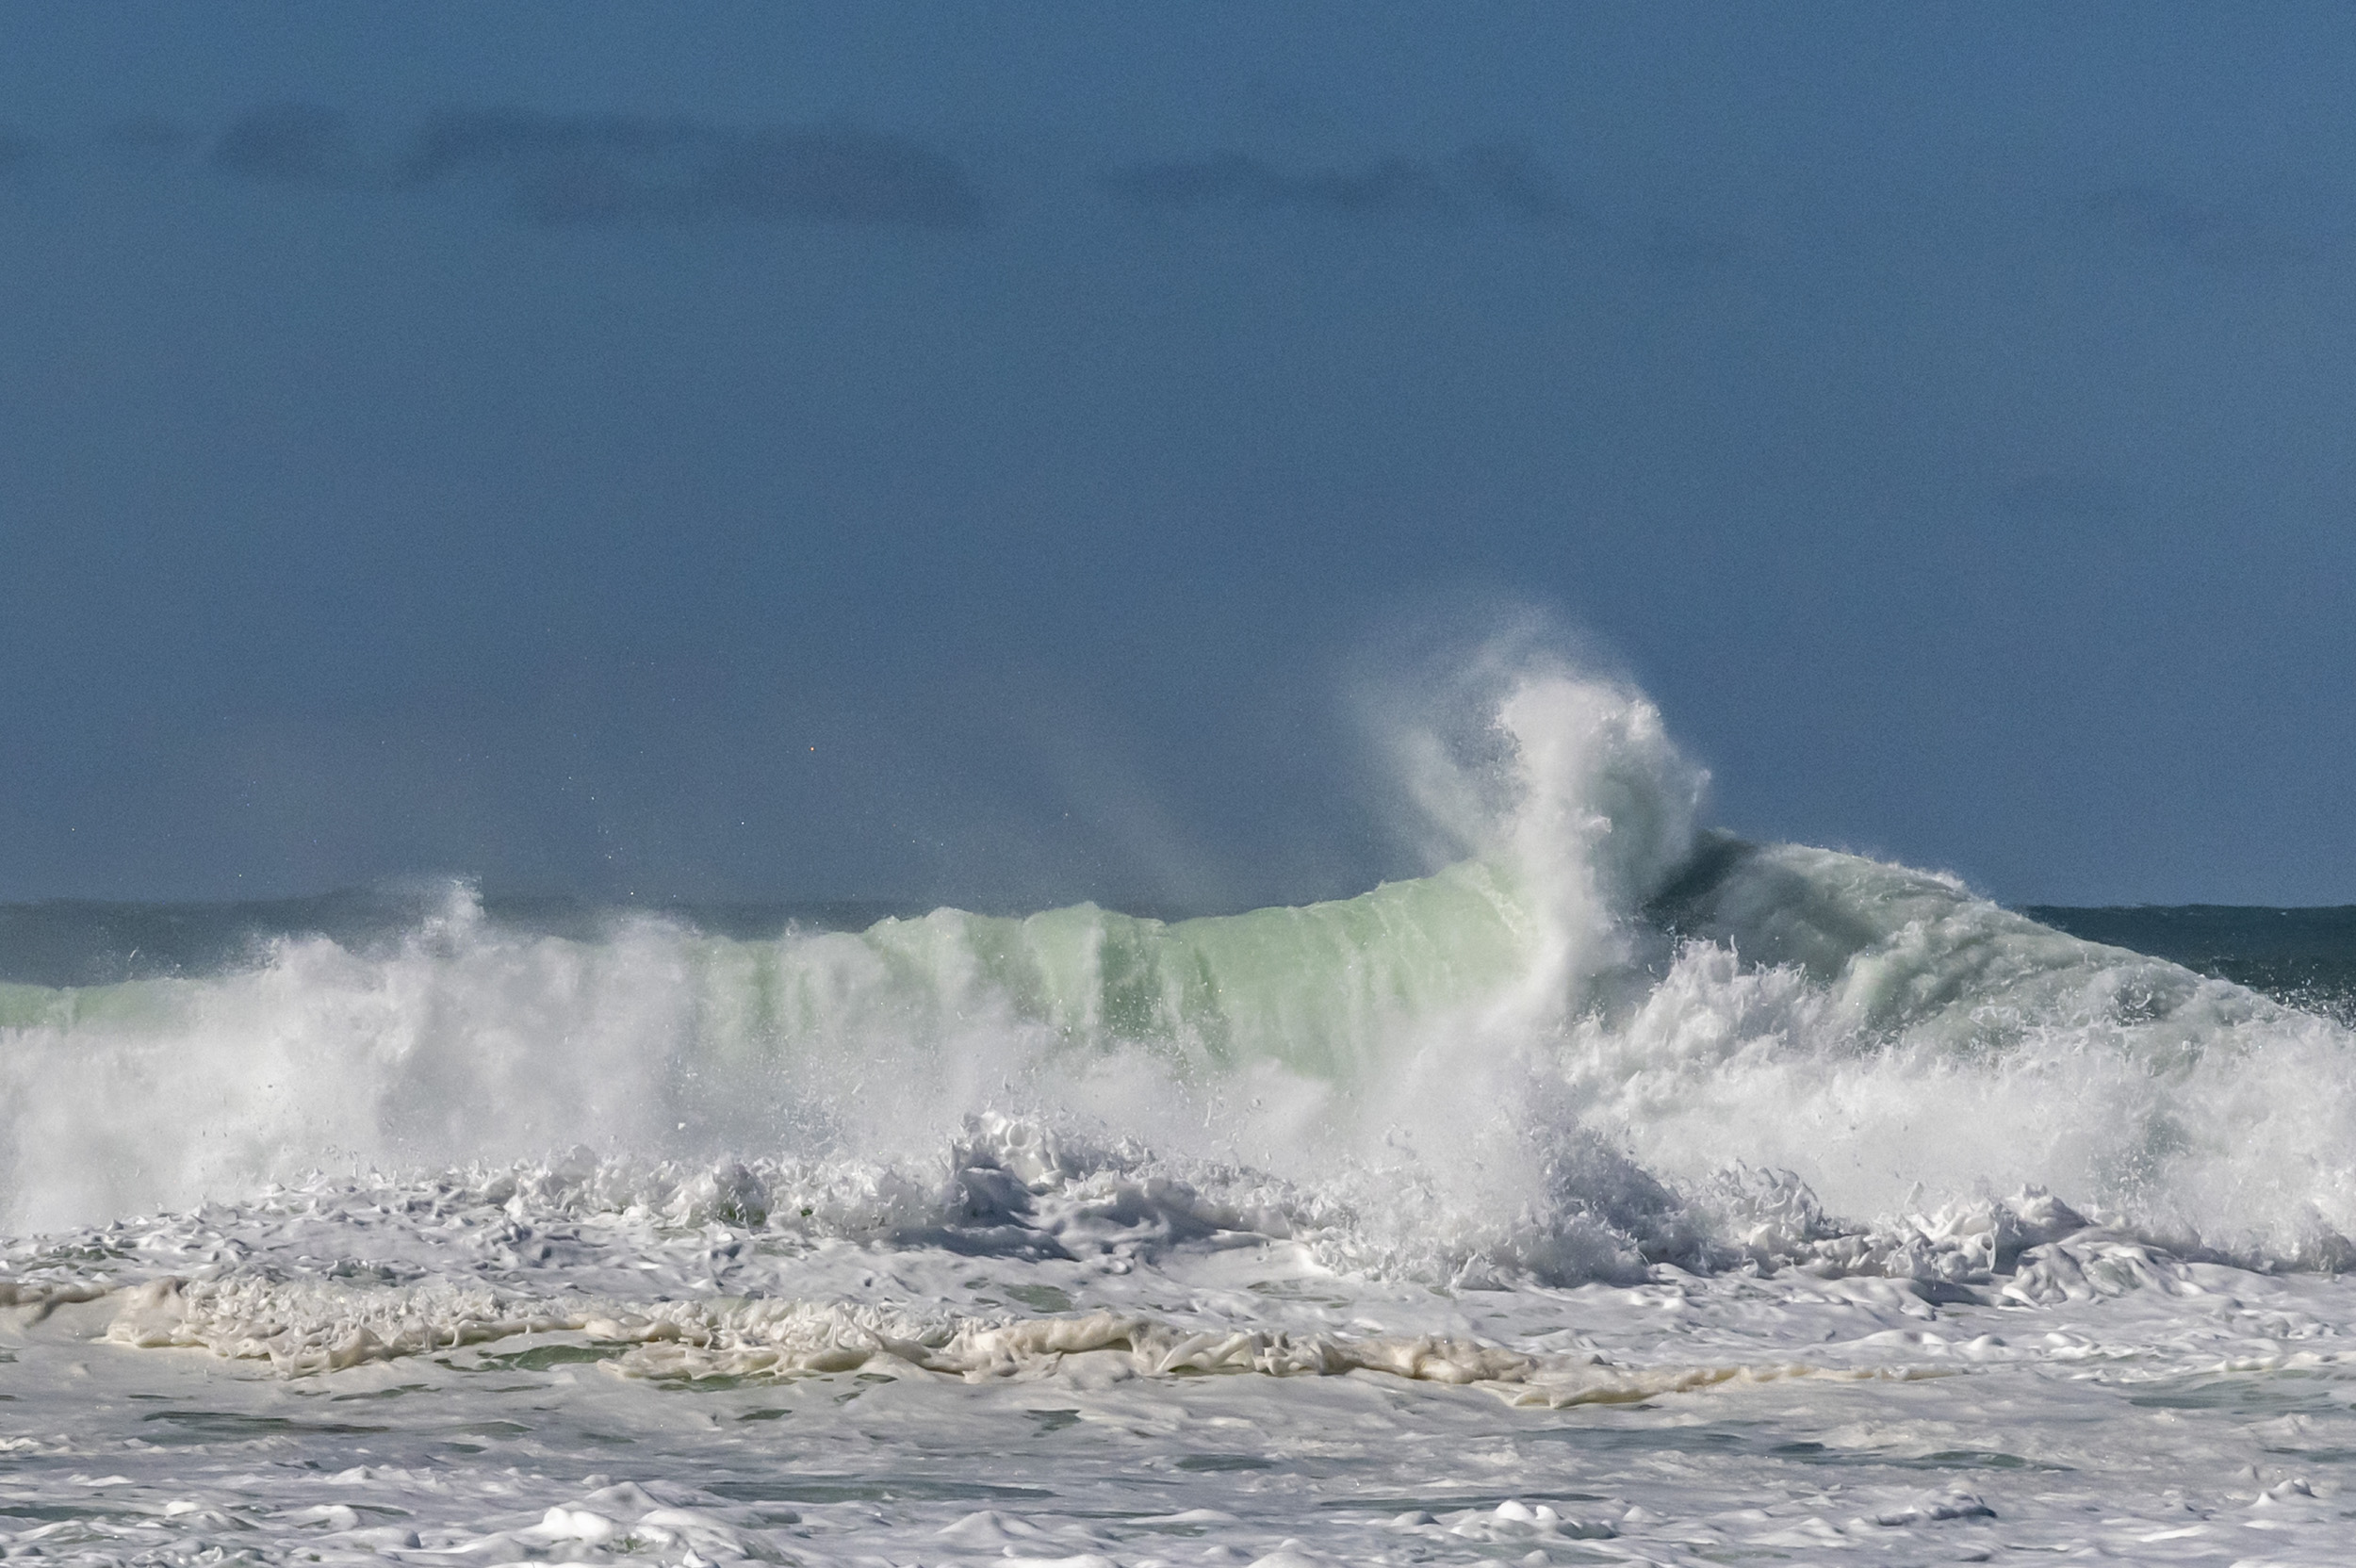 Waves at Praia do Norte - Praia do Norte, Portugal